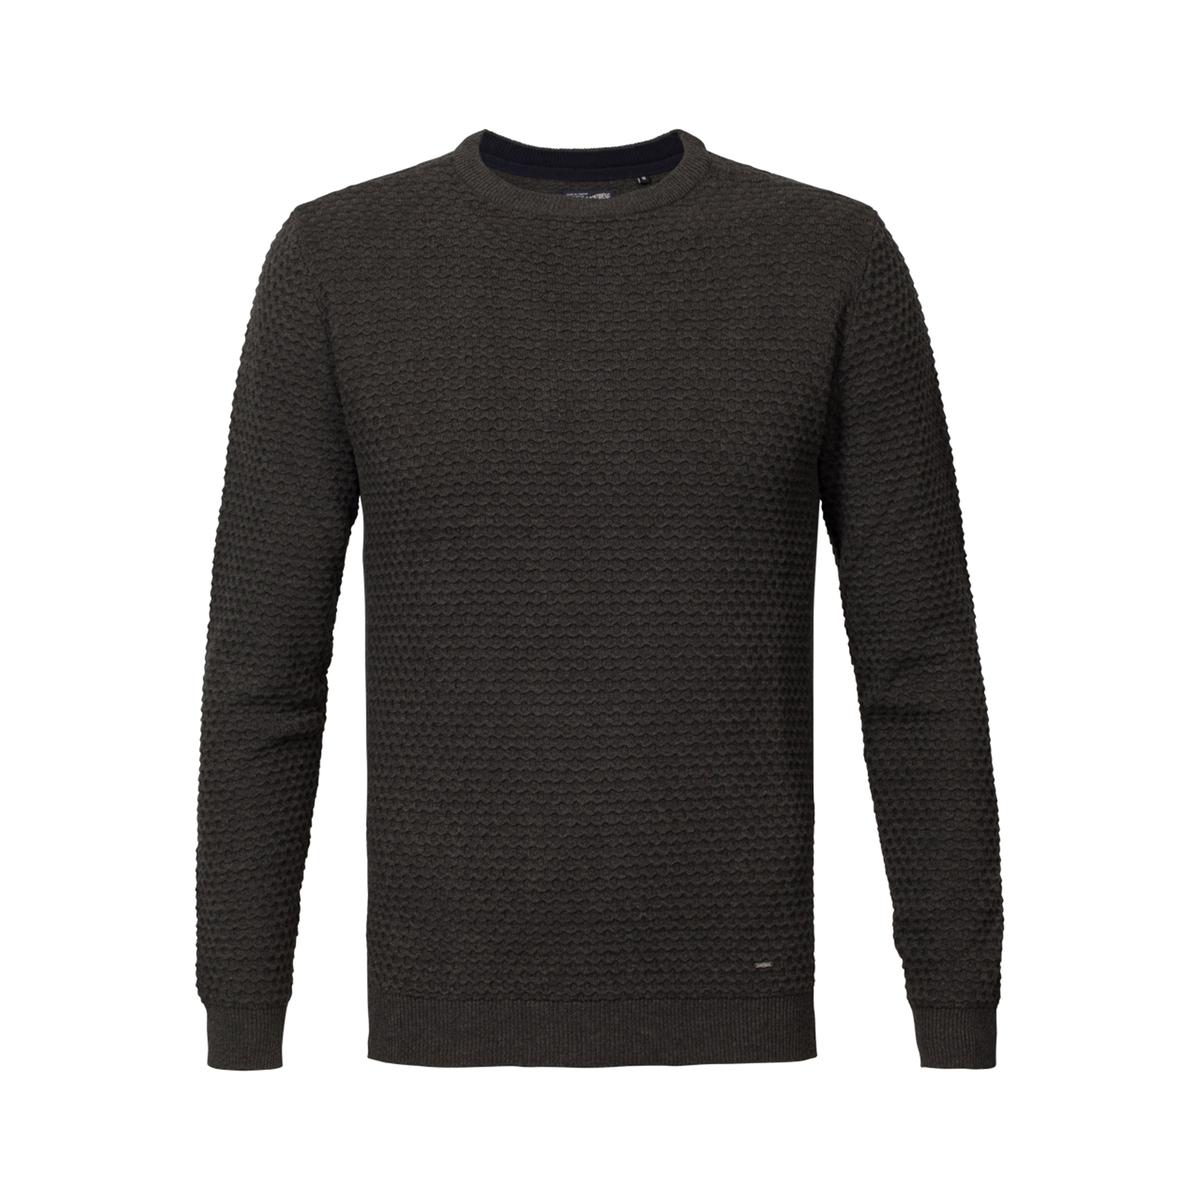 Пуловер из тонкого трикотажа от PETROL INDUSTRIES